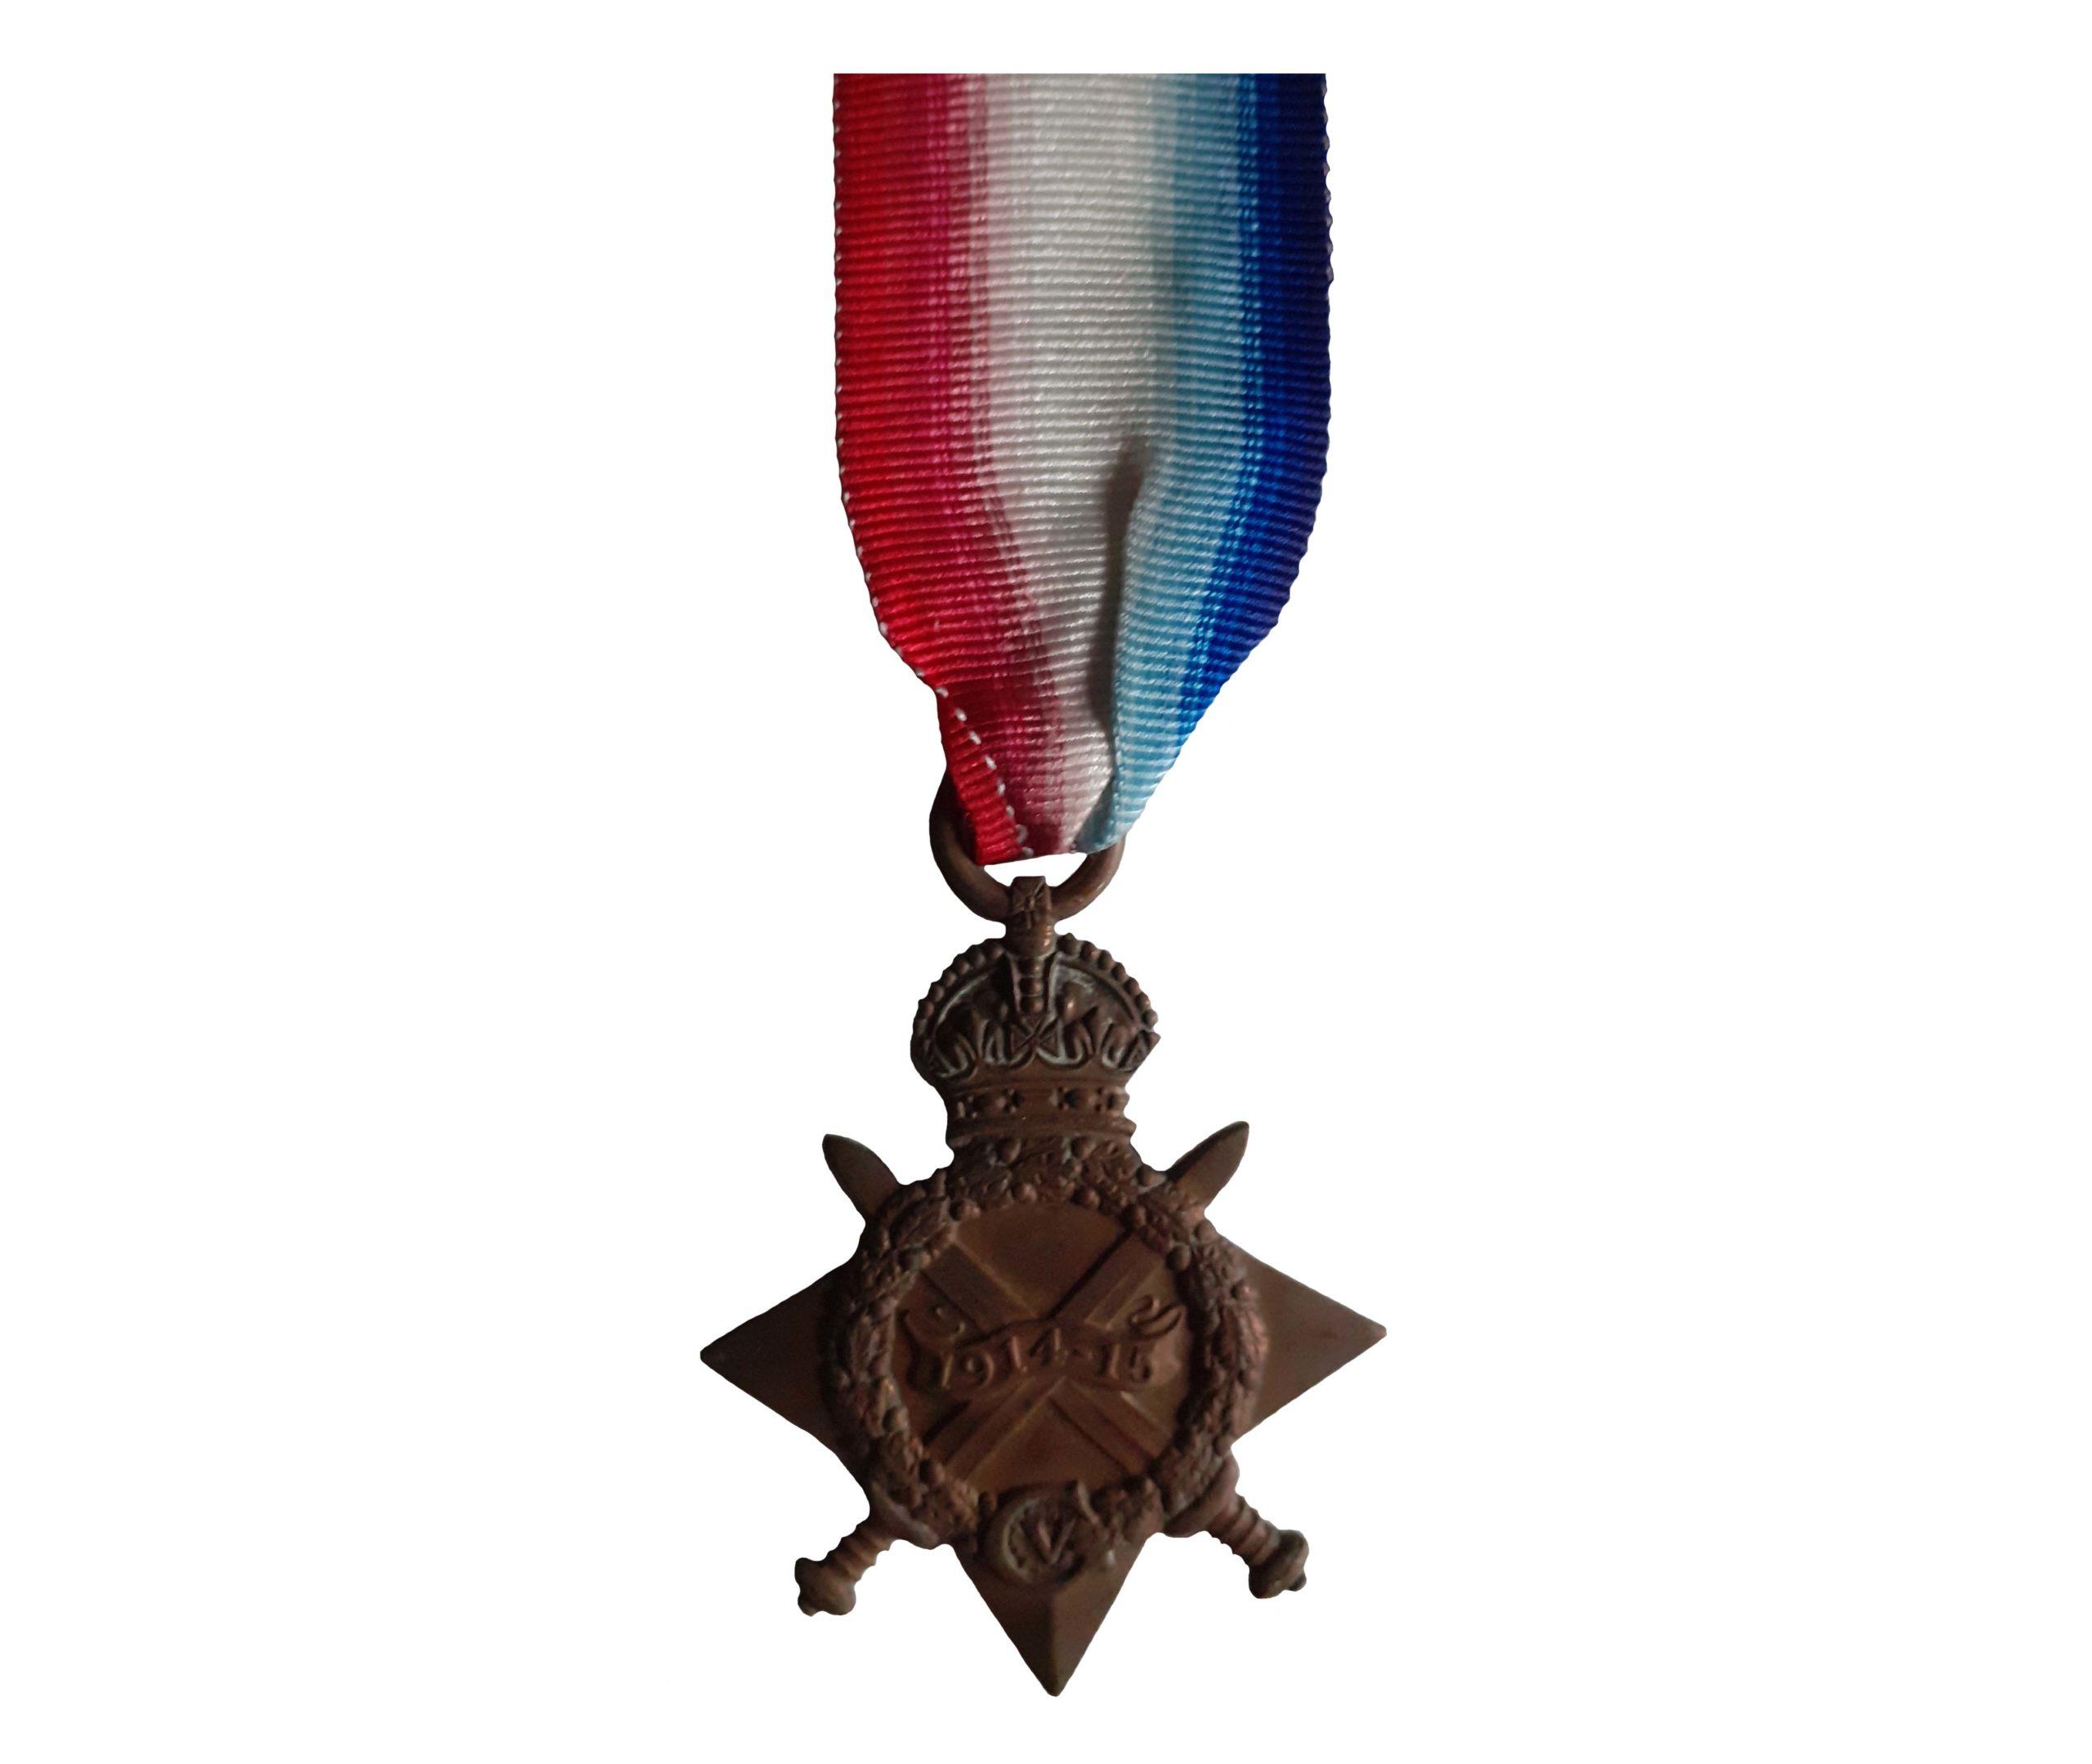 The 1914-15 Star awarded to Gunner Charles Ballard